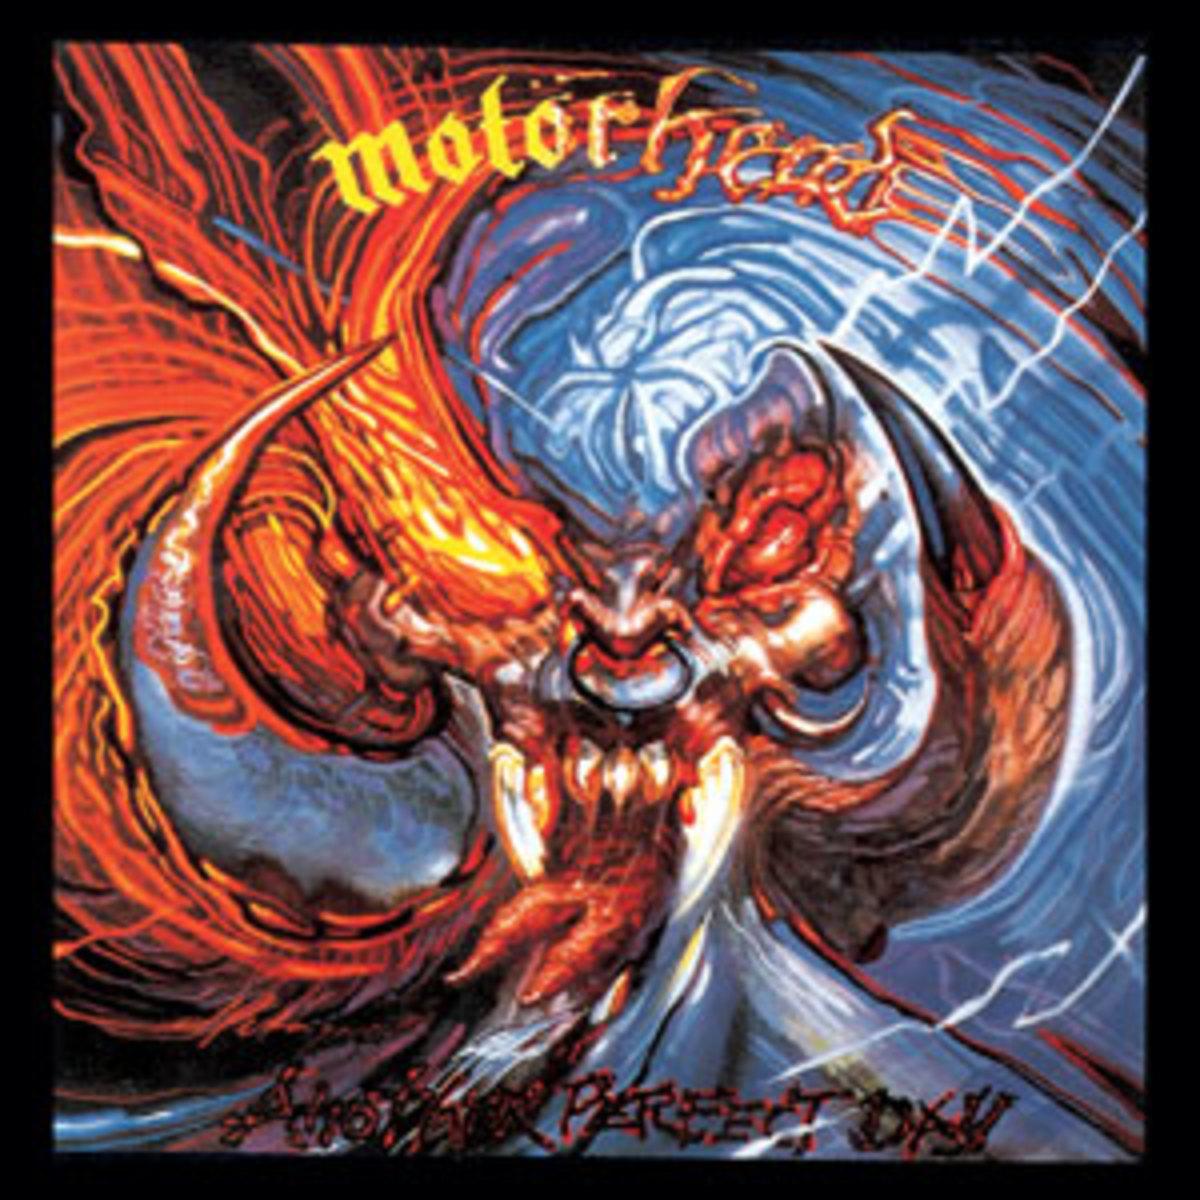 Motorhead_AnotherPerfectDay